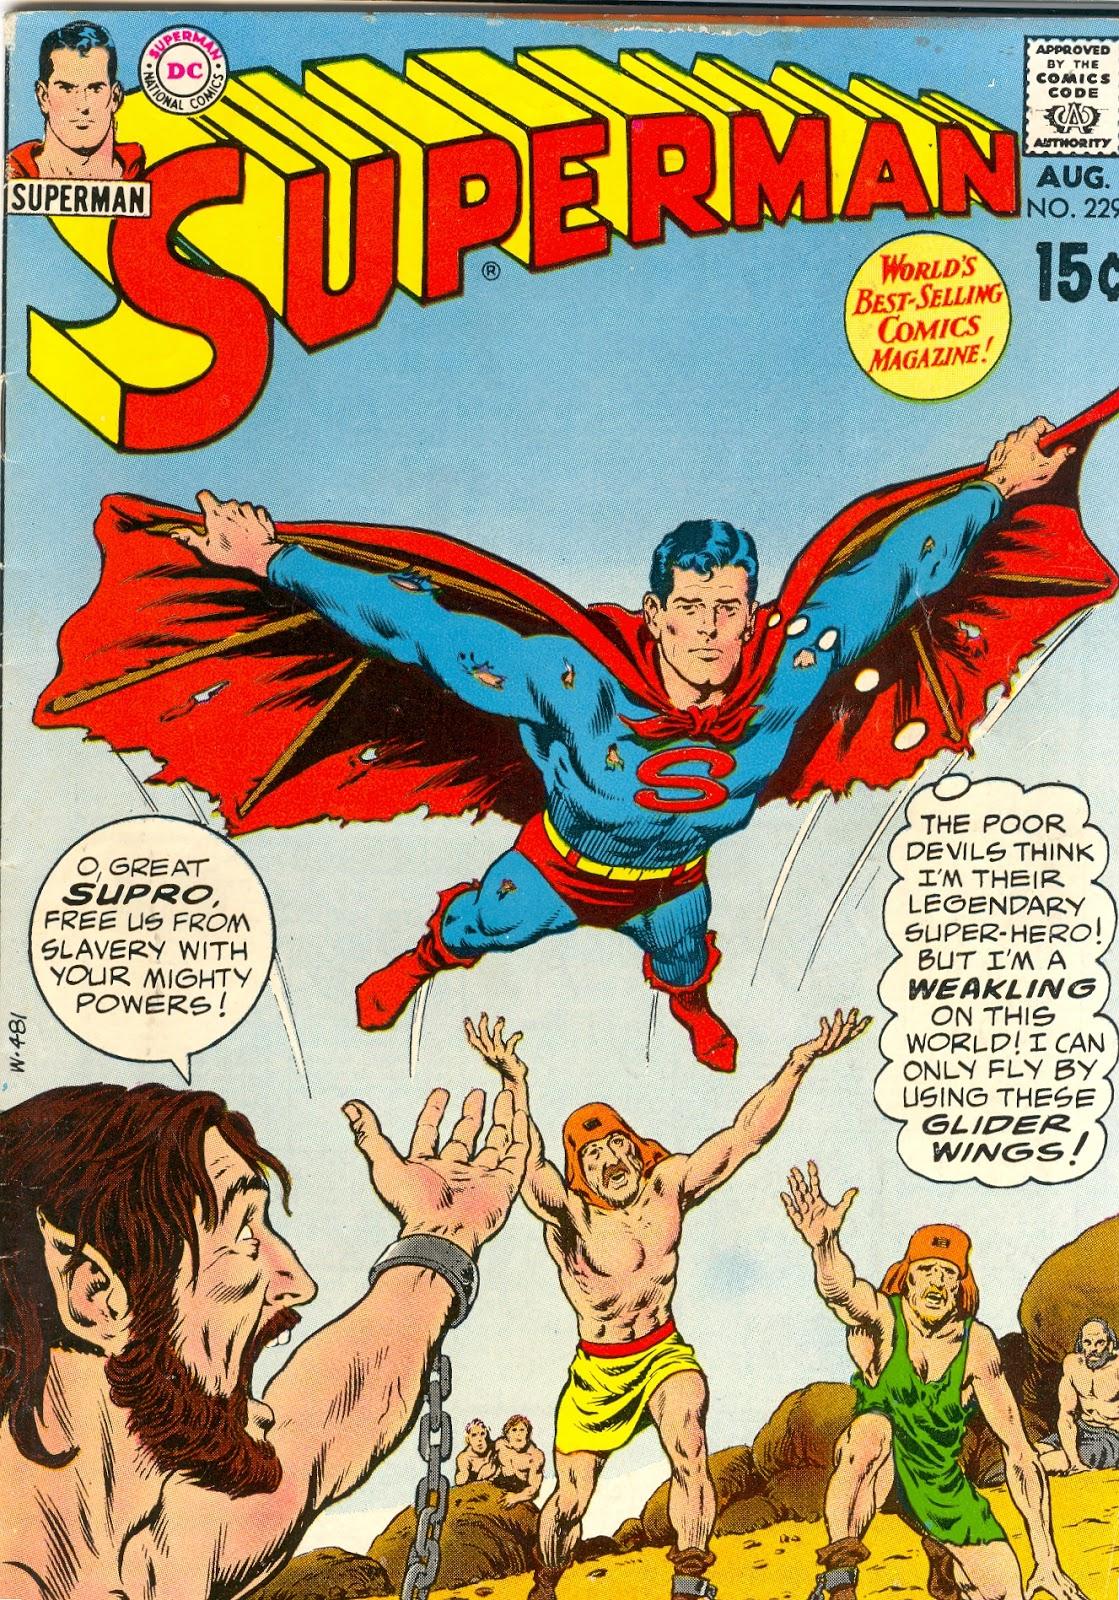 Superman Comic Book Cover Art : Retrospace classic superman comic covers